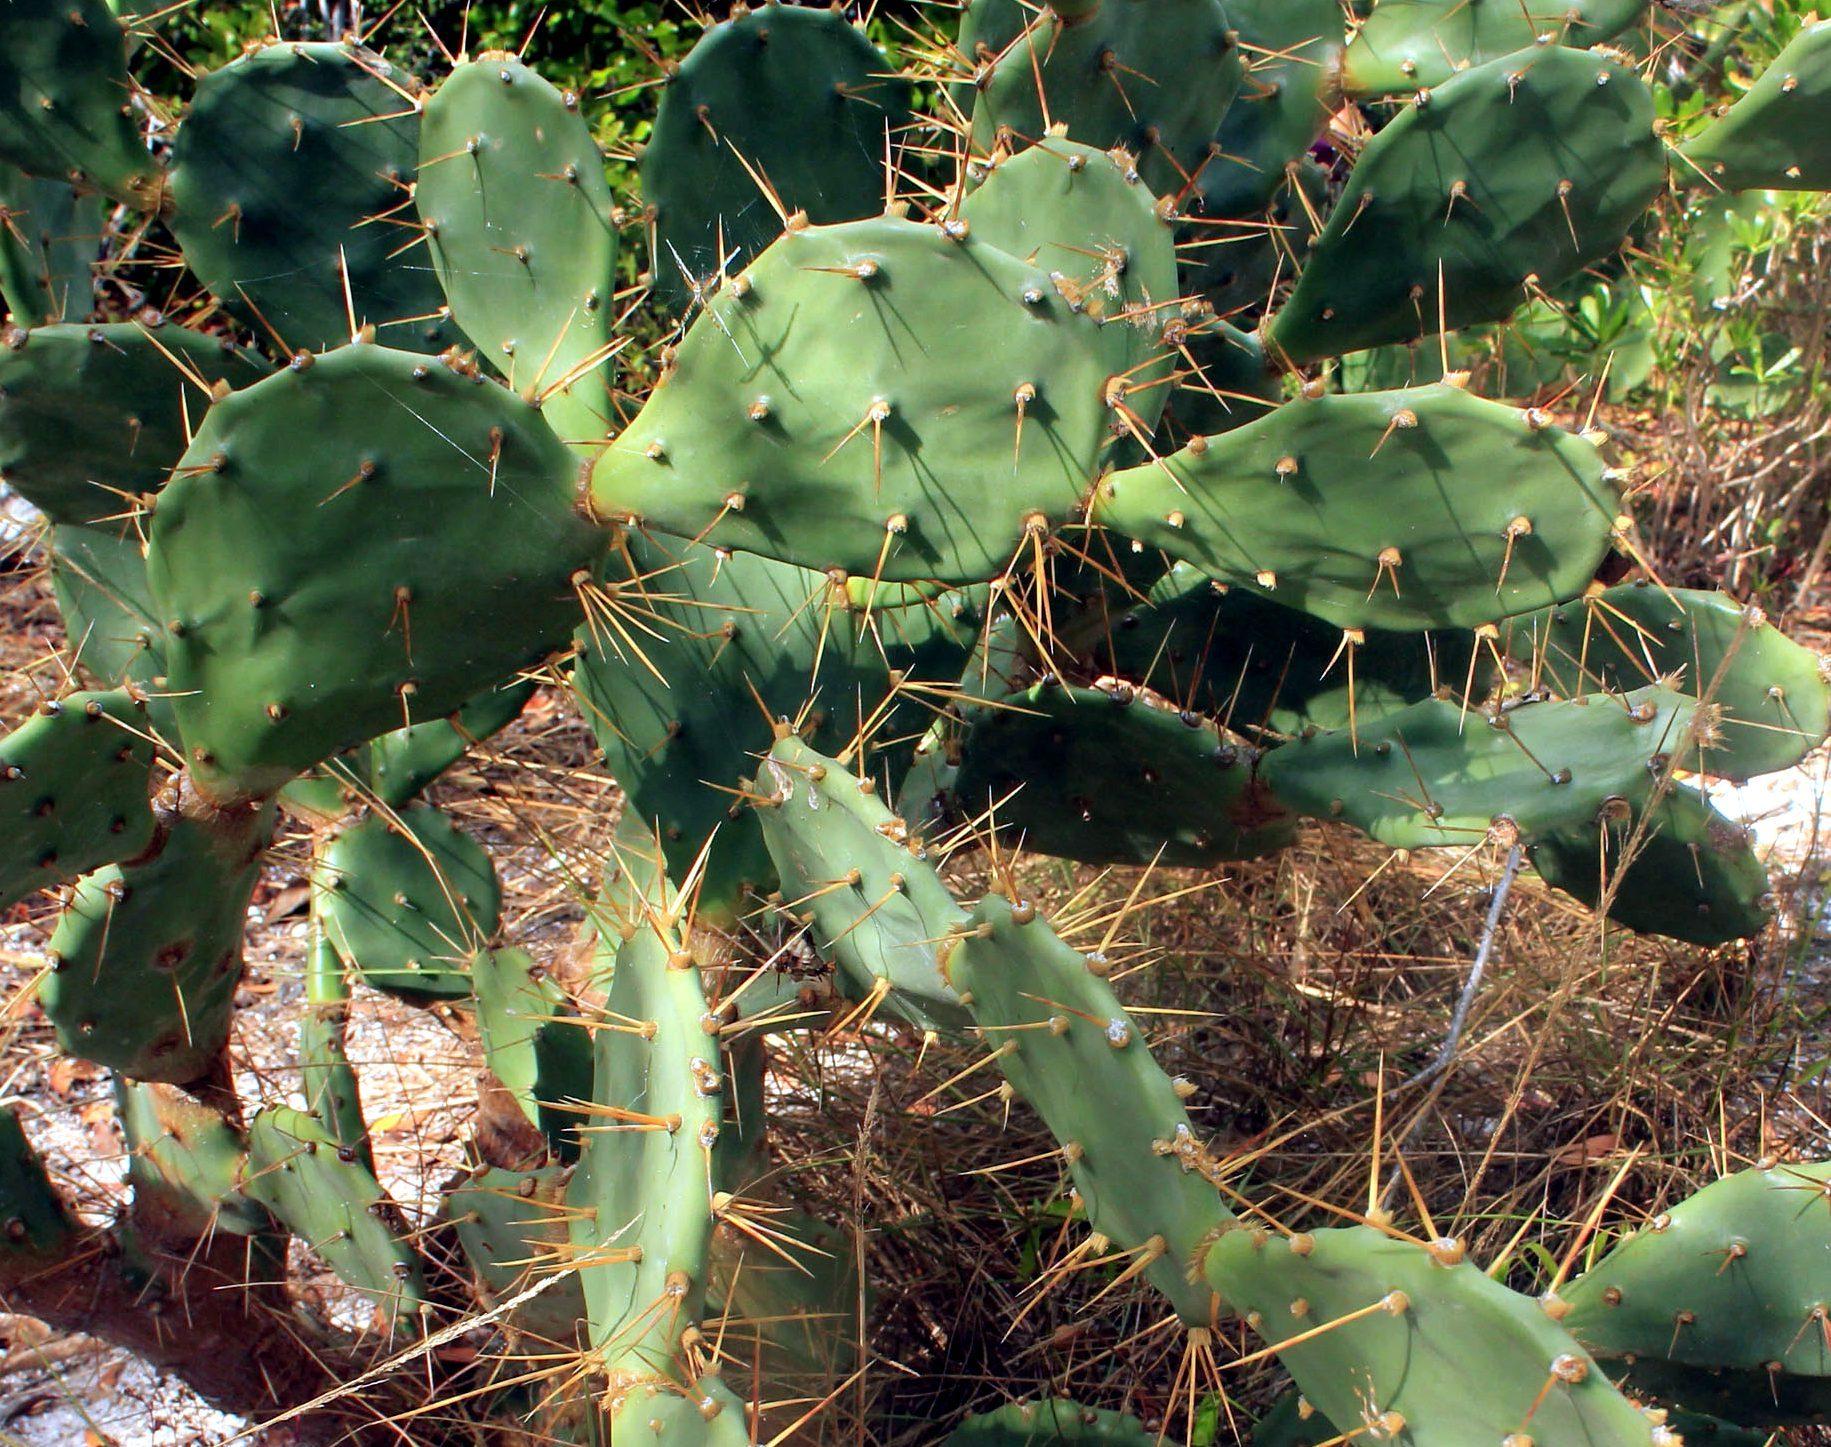 Prickly Pear Cactus Pictures Public Domain